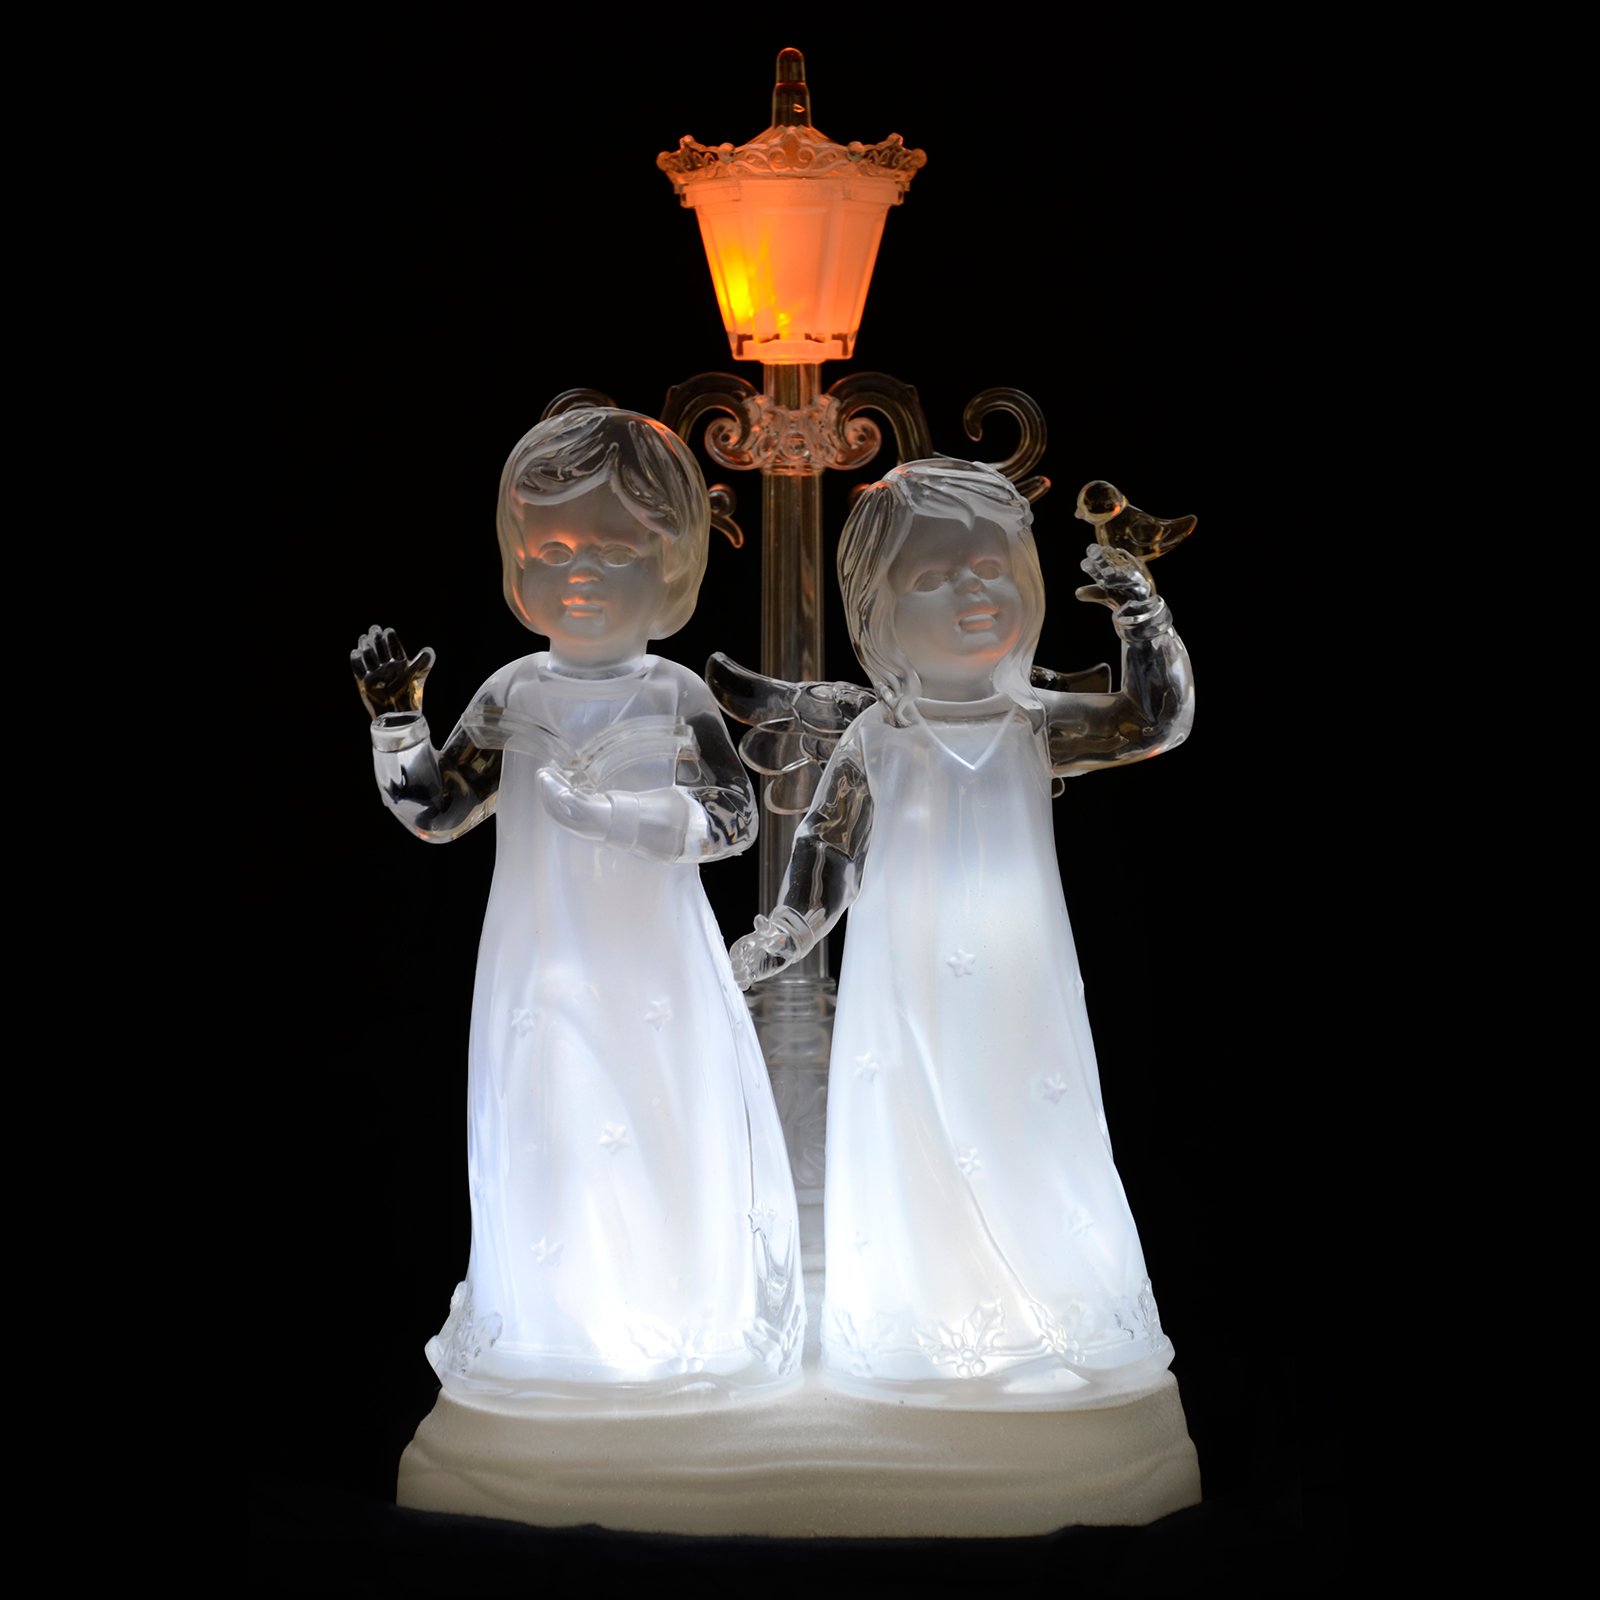 Pictures of old railroad lanterns Australian art - Wikipedia